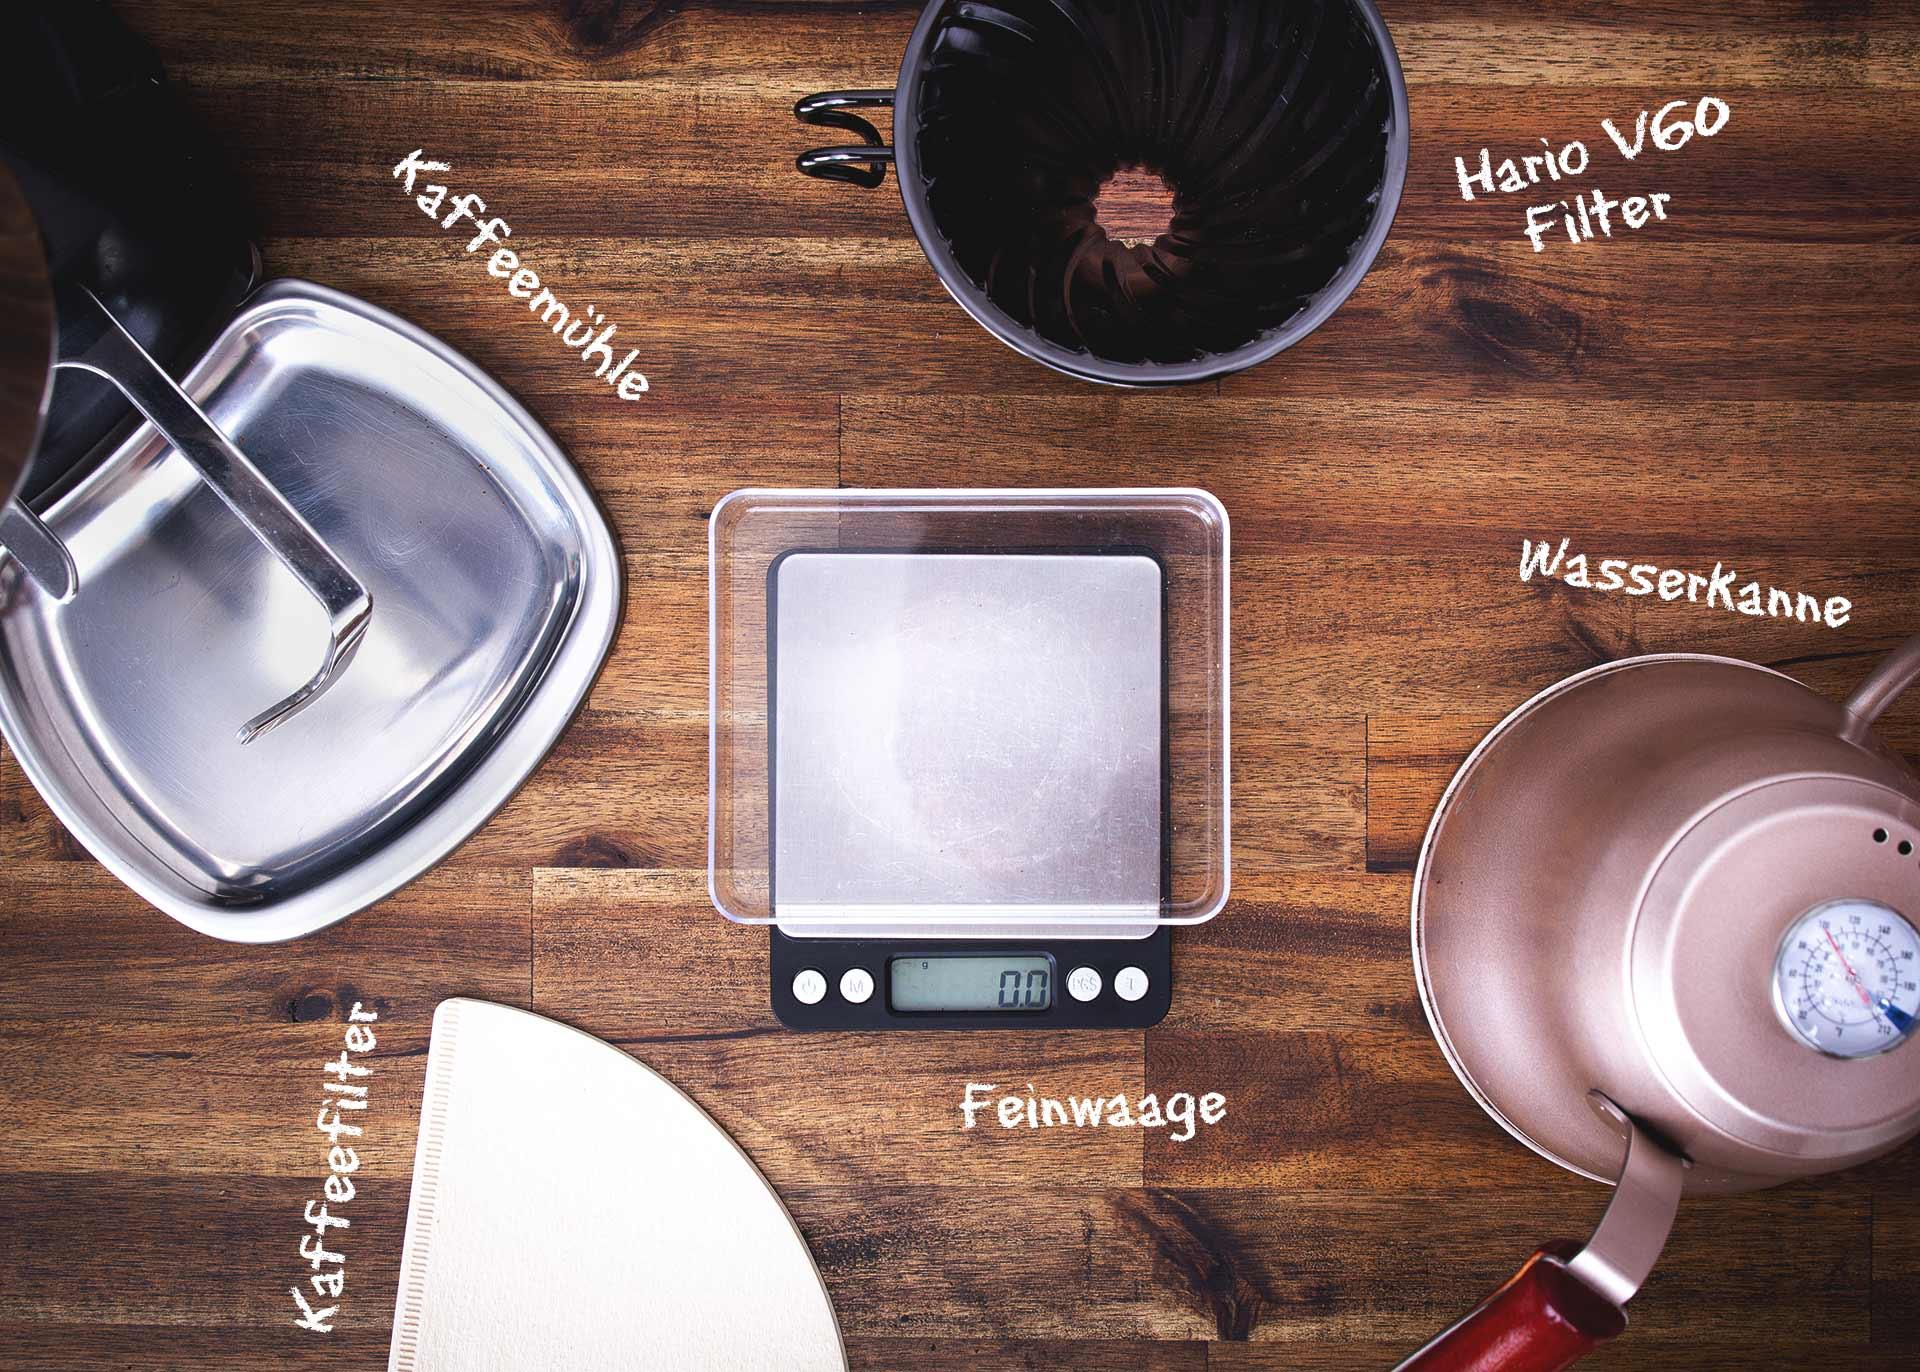 Guide: Kaffeezubereitung mit dem Hario V60 Handfilter. CafCaf.de – Kaffee & Blog, Kaffeeblog